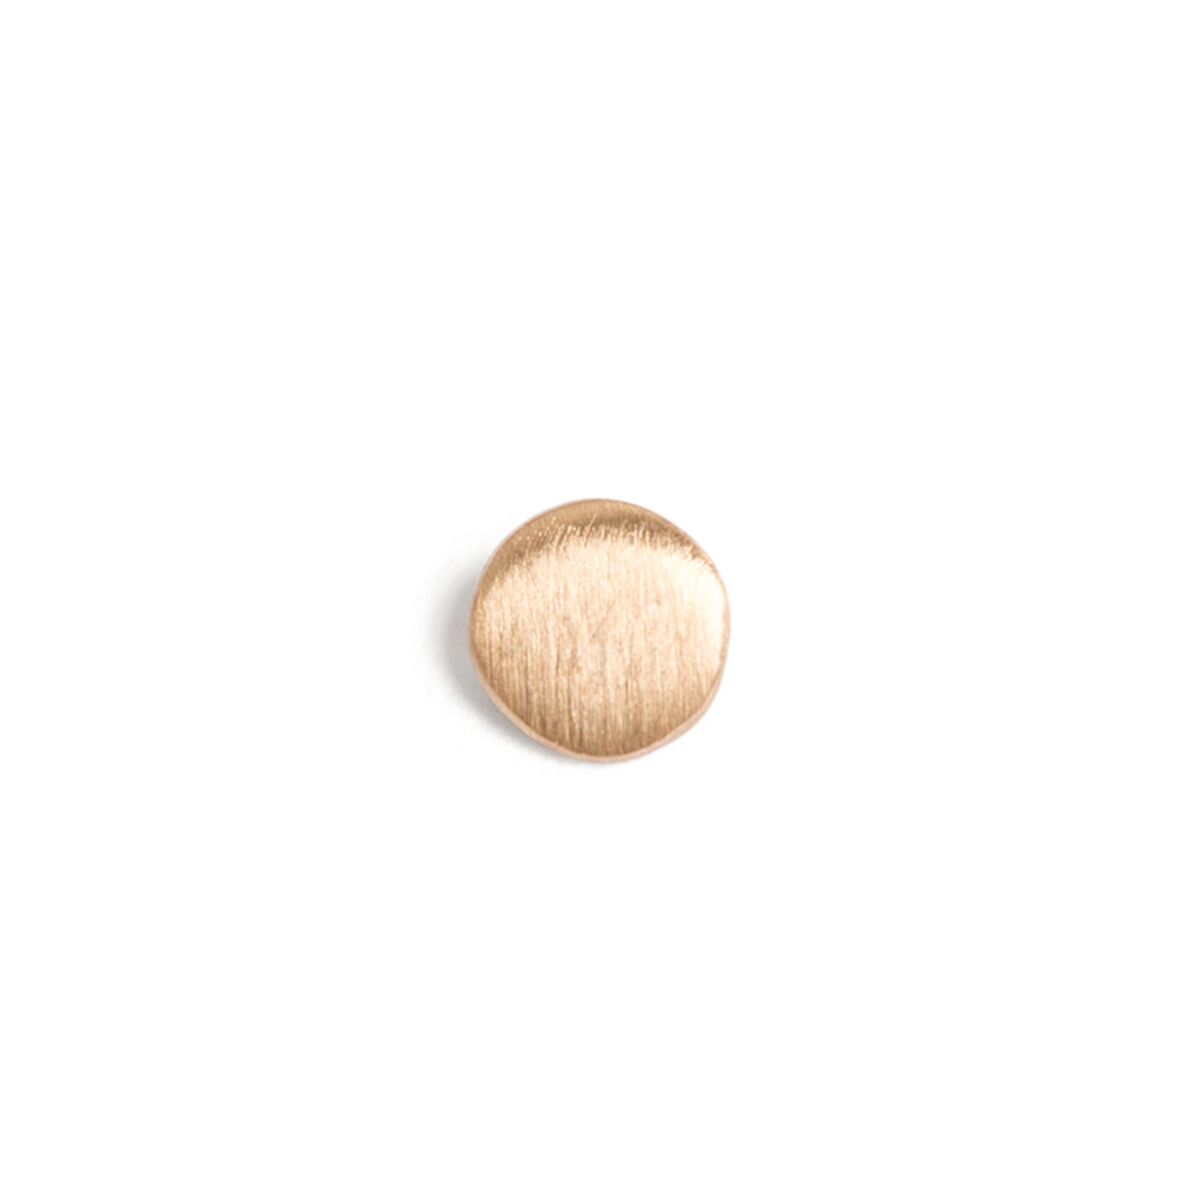 Dot Stud Earring, yellow gold (single) image